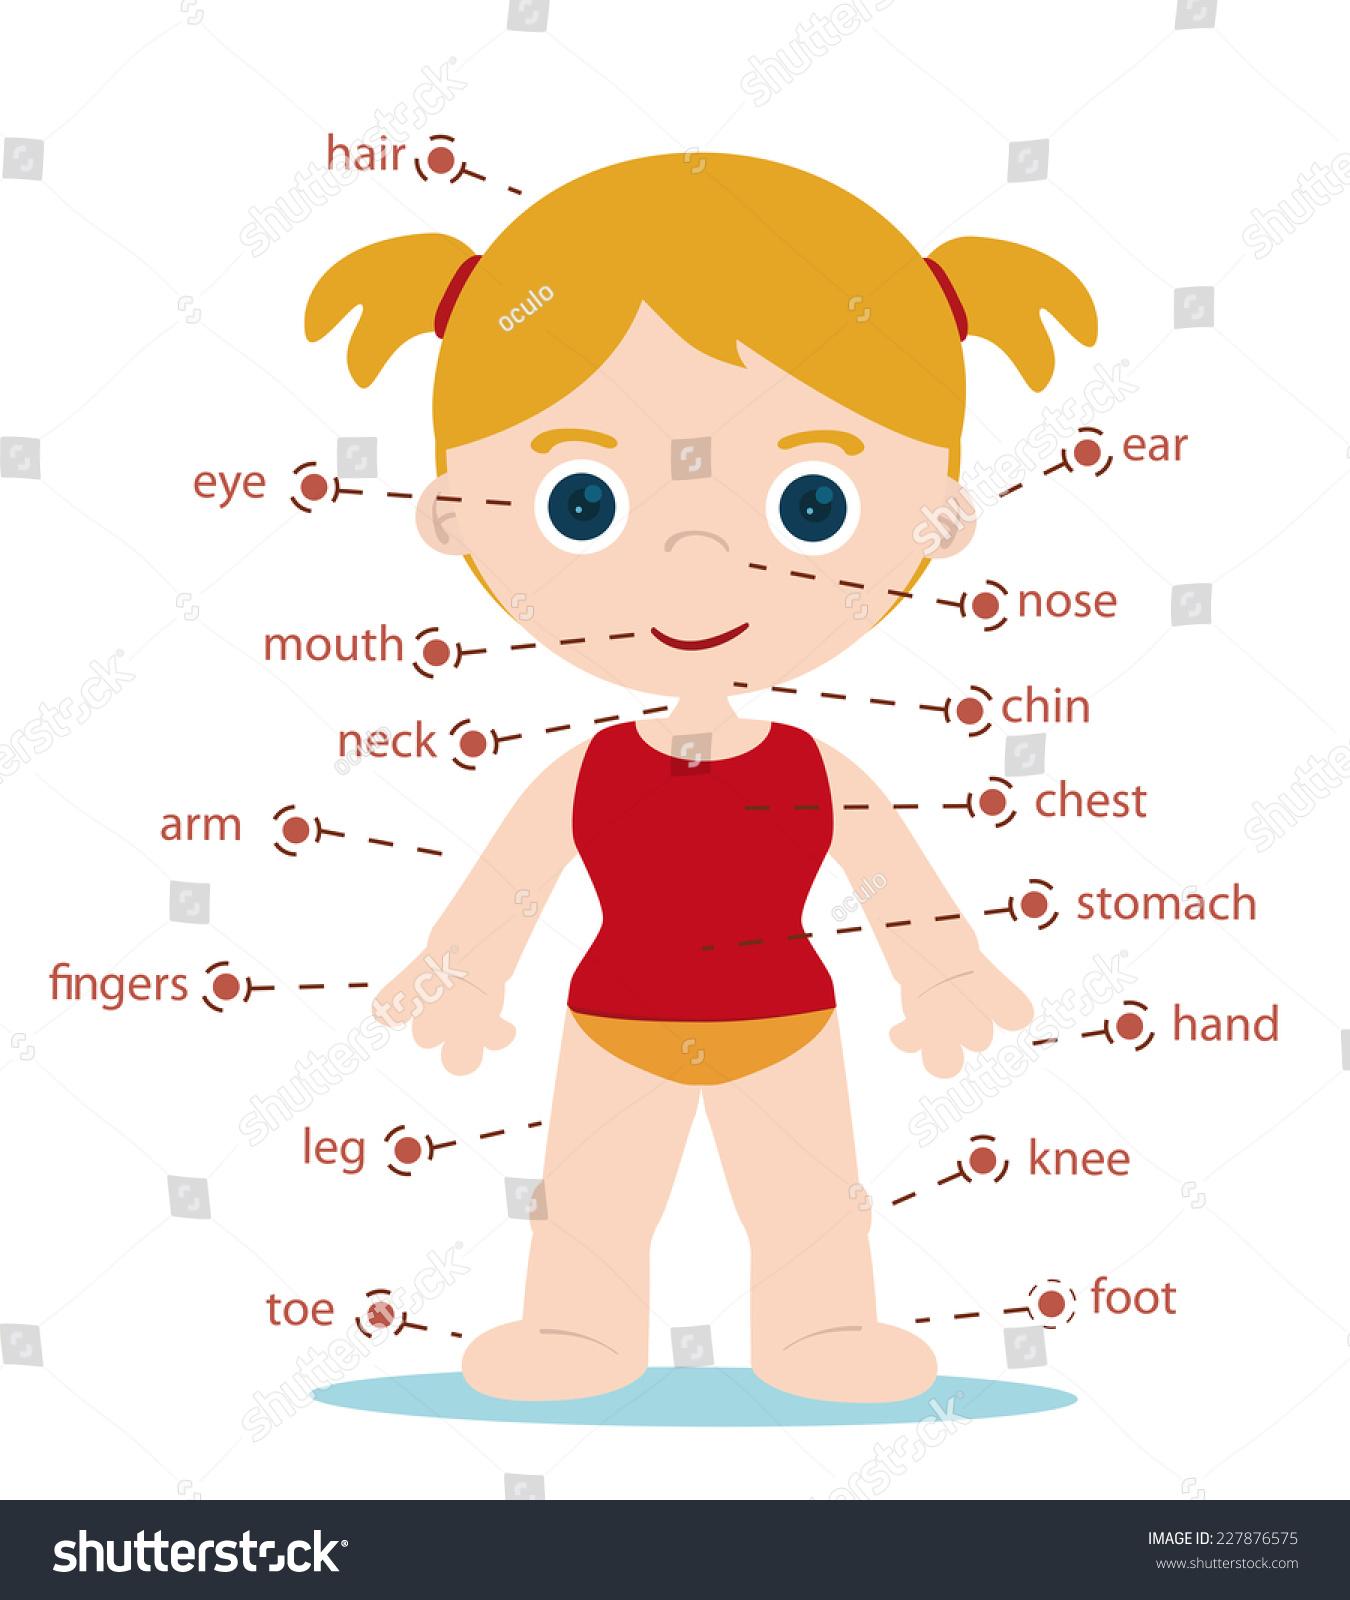 Girl Body Parts Chart For School Stock Vector Illustration